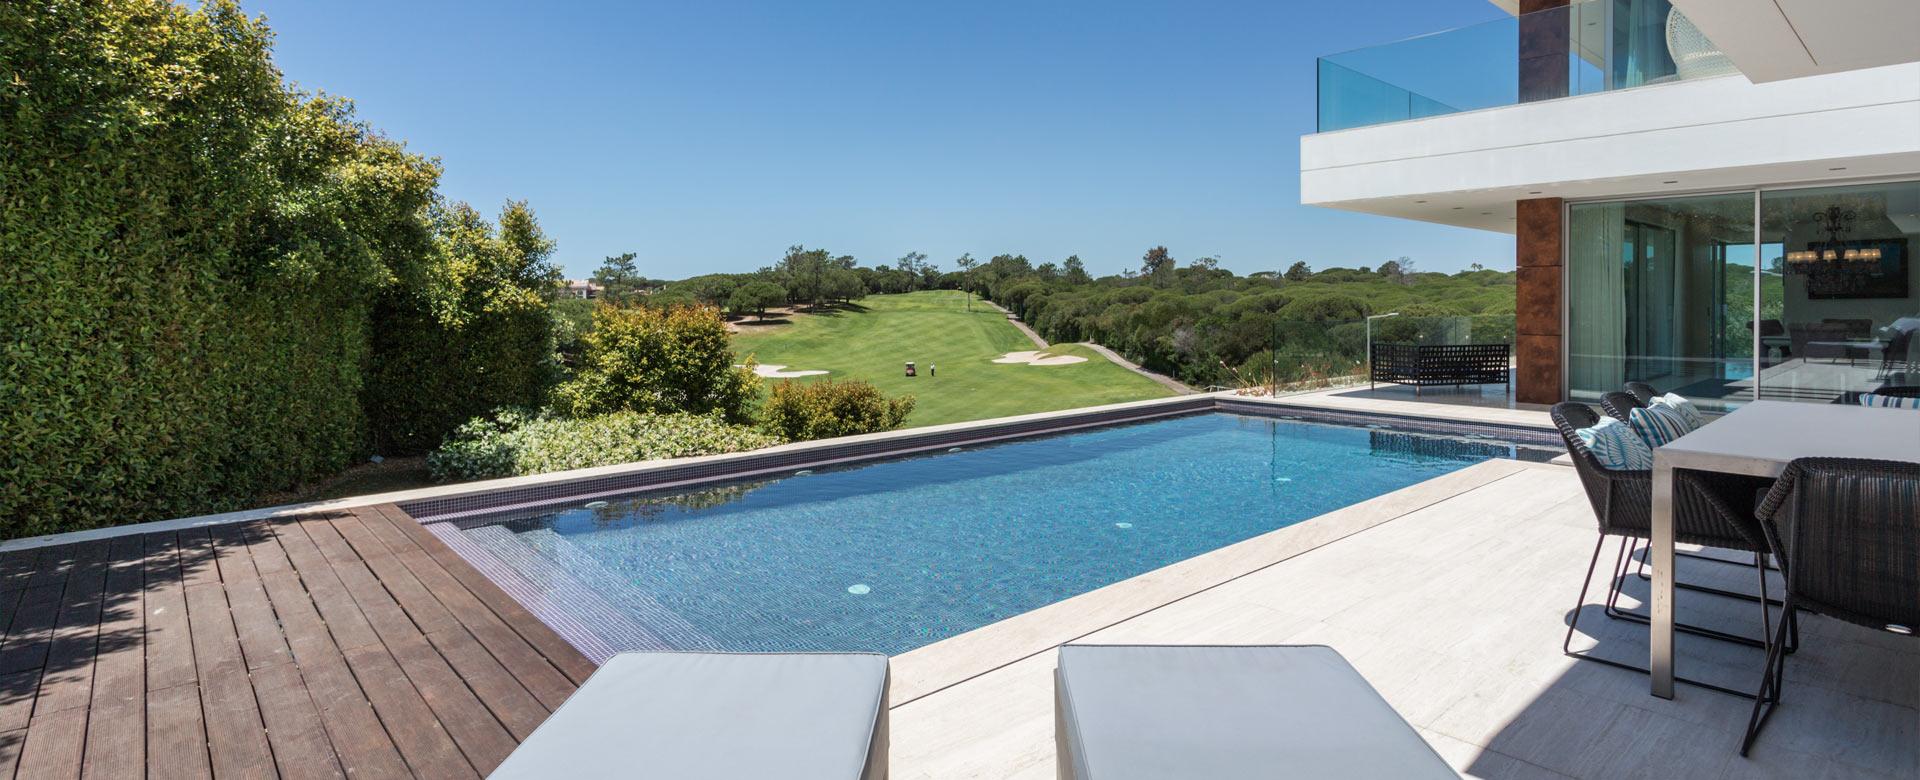 Location De Villa De Luxe Au Portugal | Villanovo concernant Location Villa Portugal Avec Piscine Pas Cher